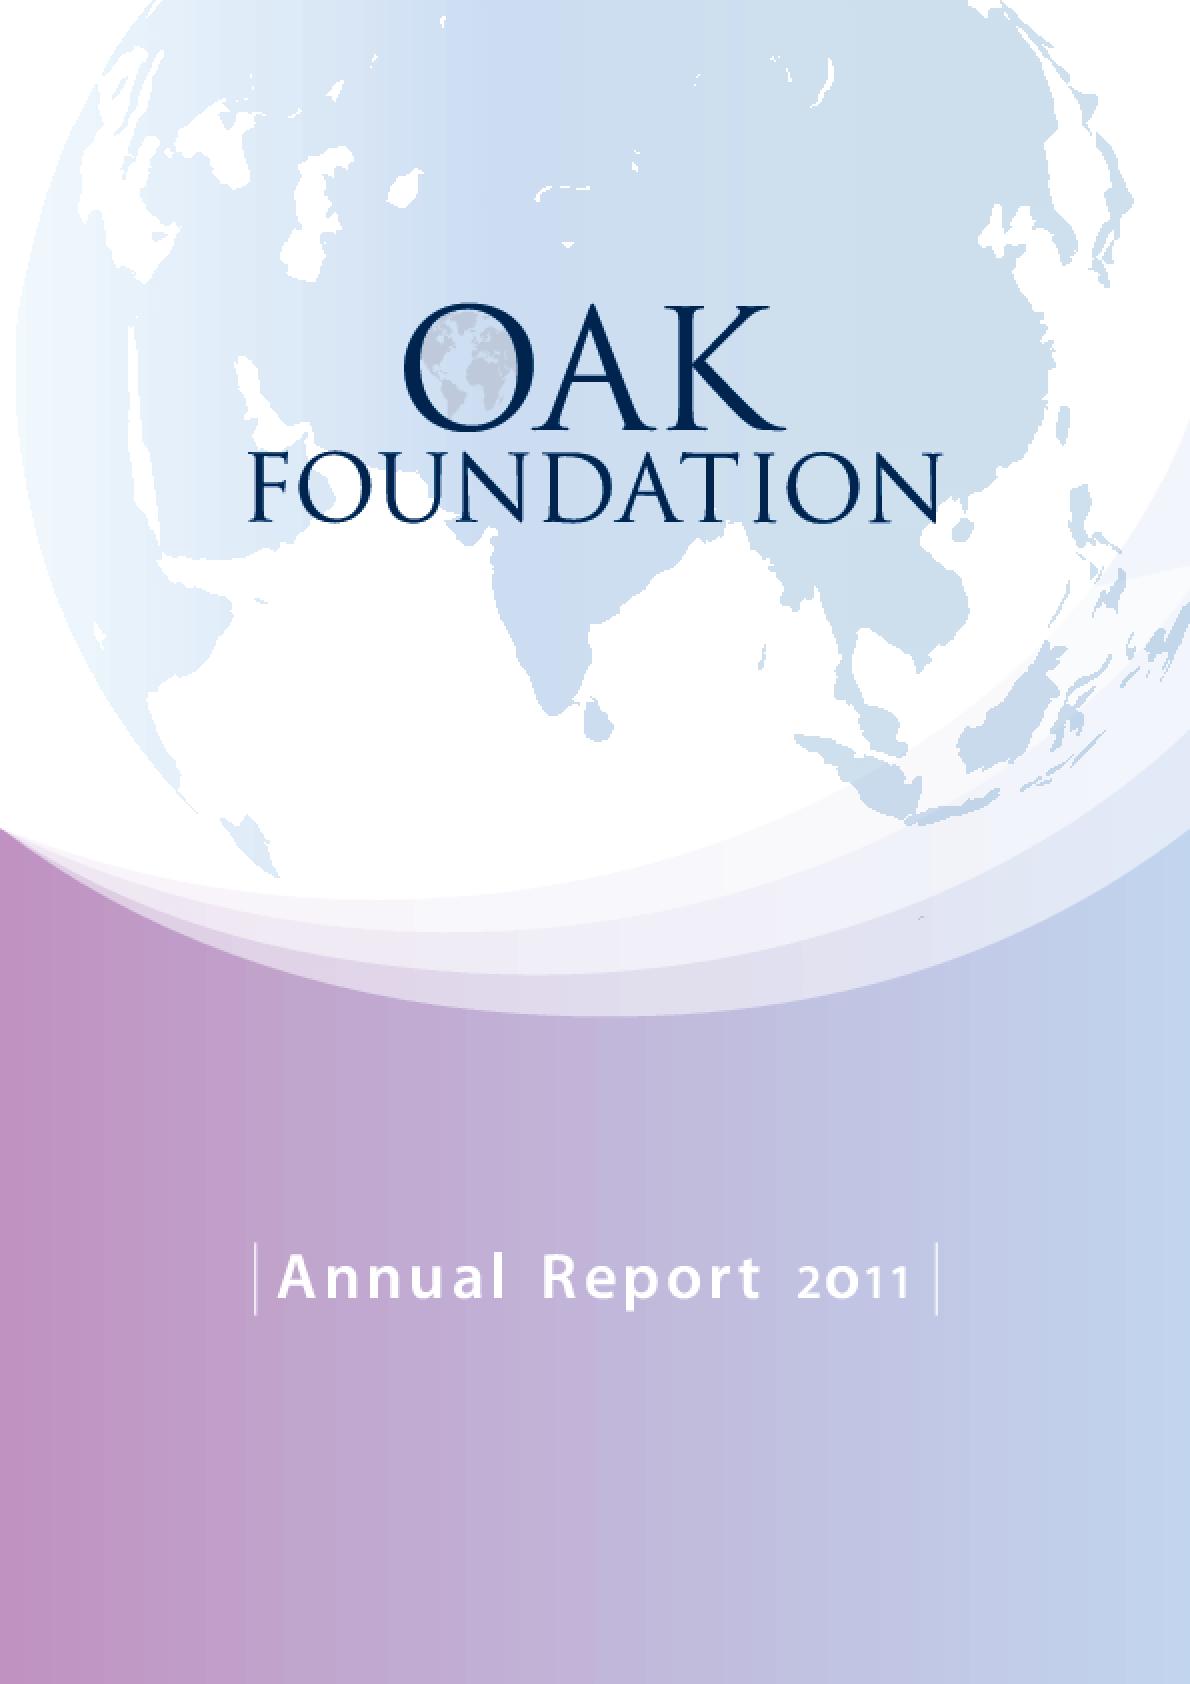 Oak Foundation Annual Report 2011